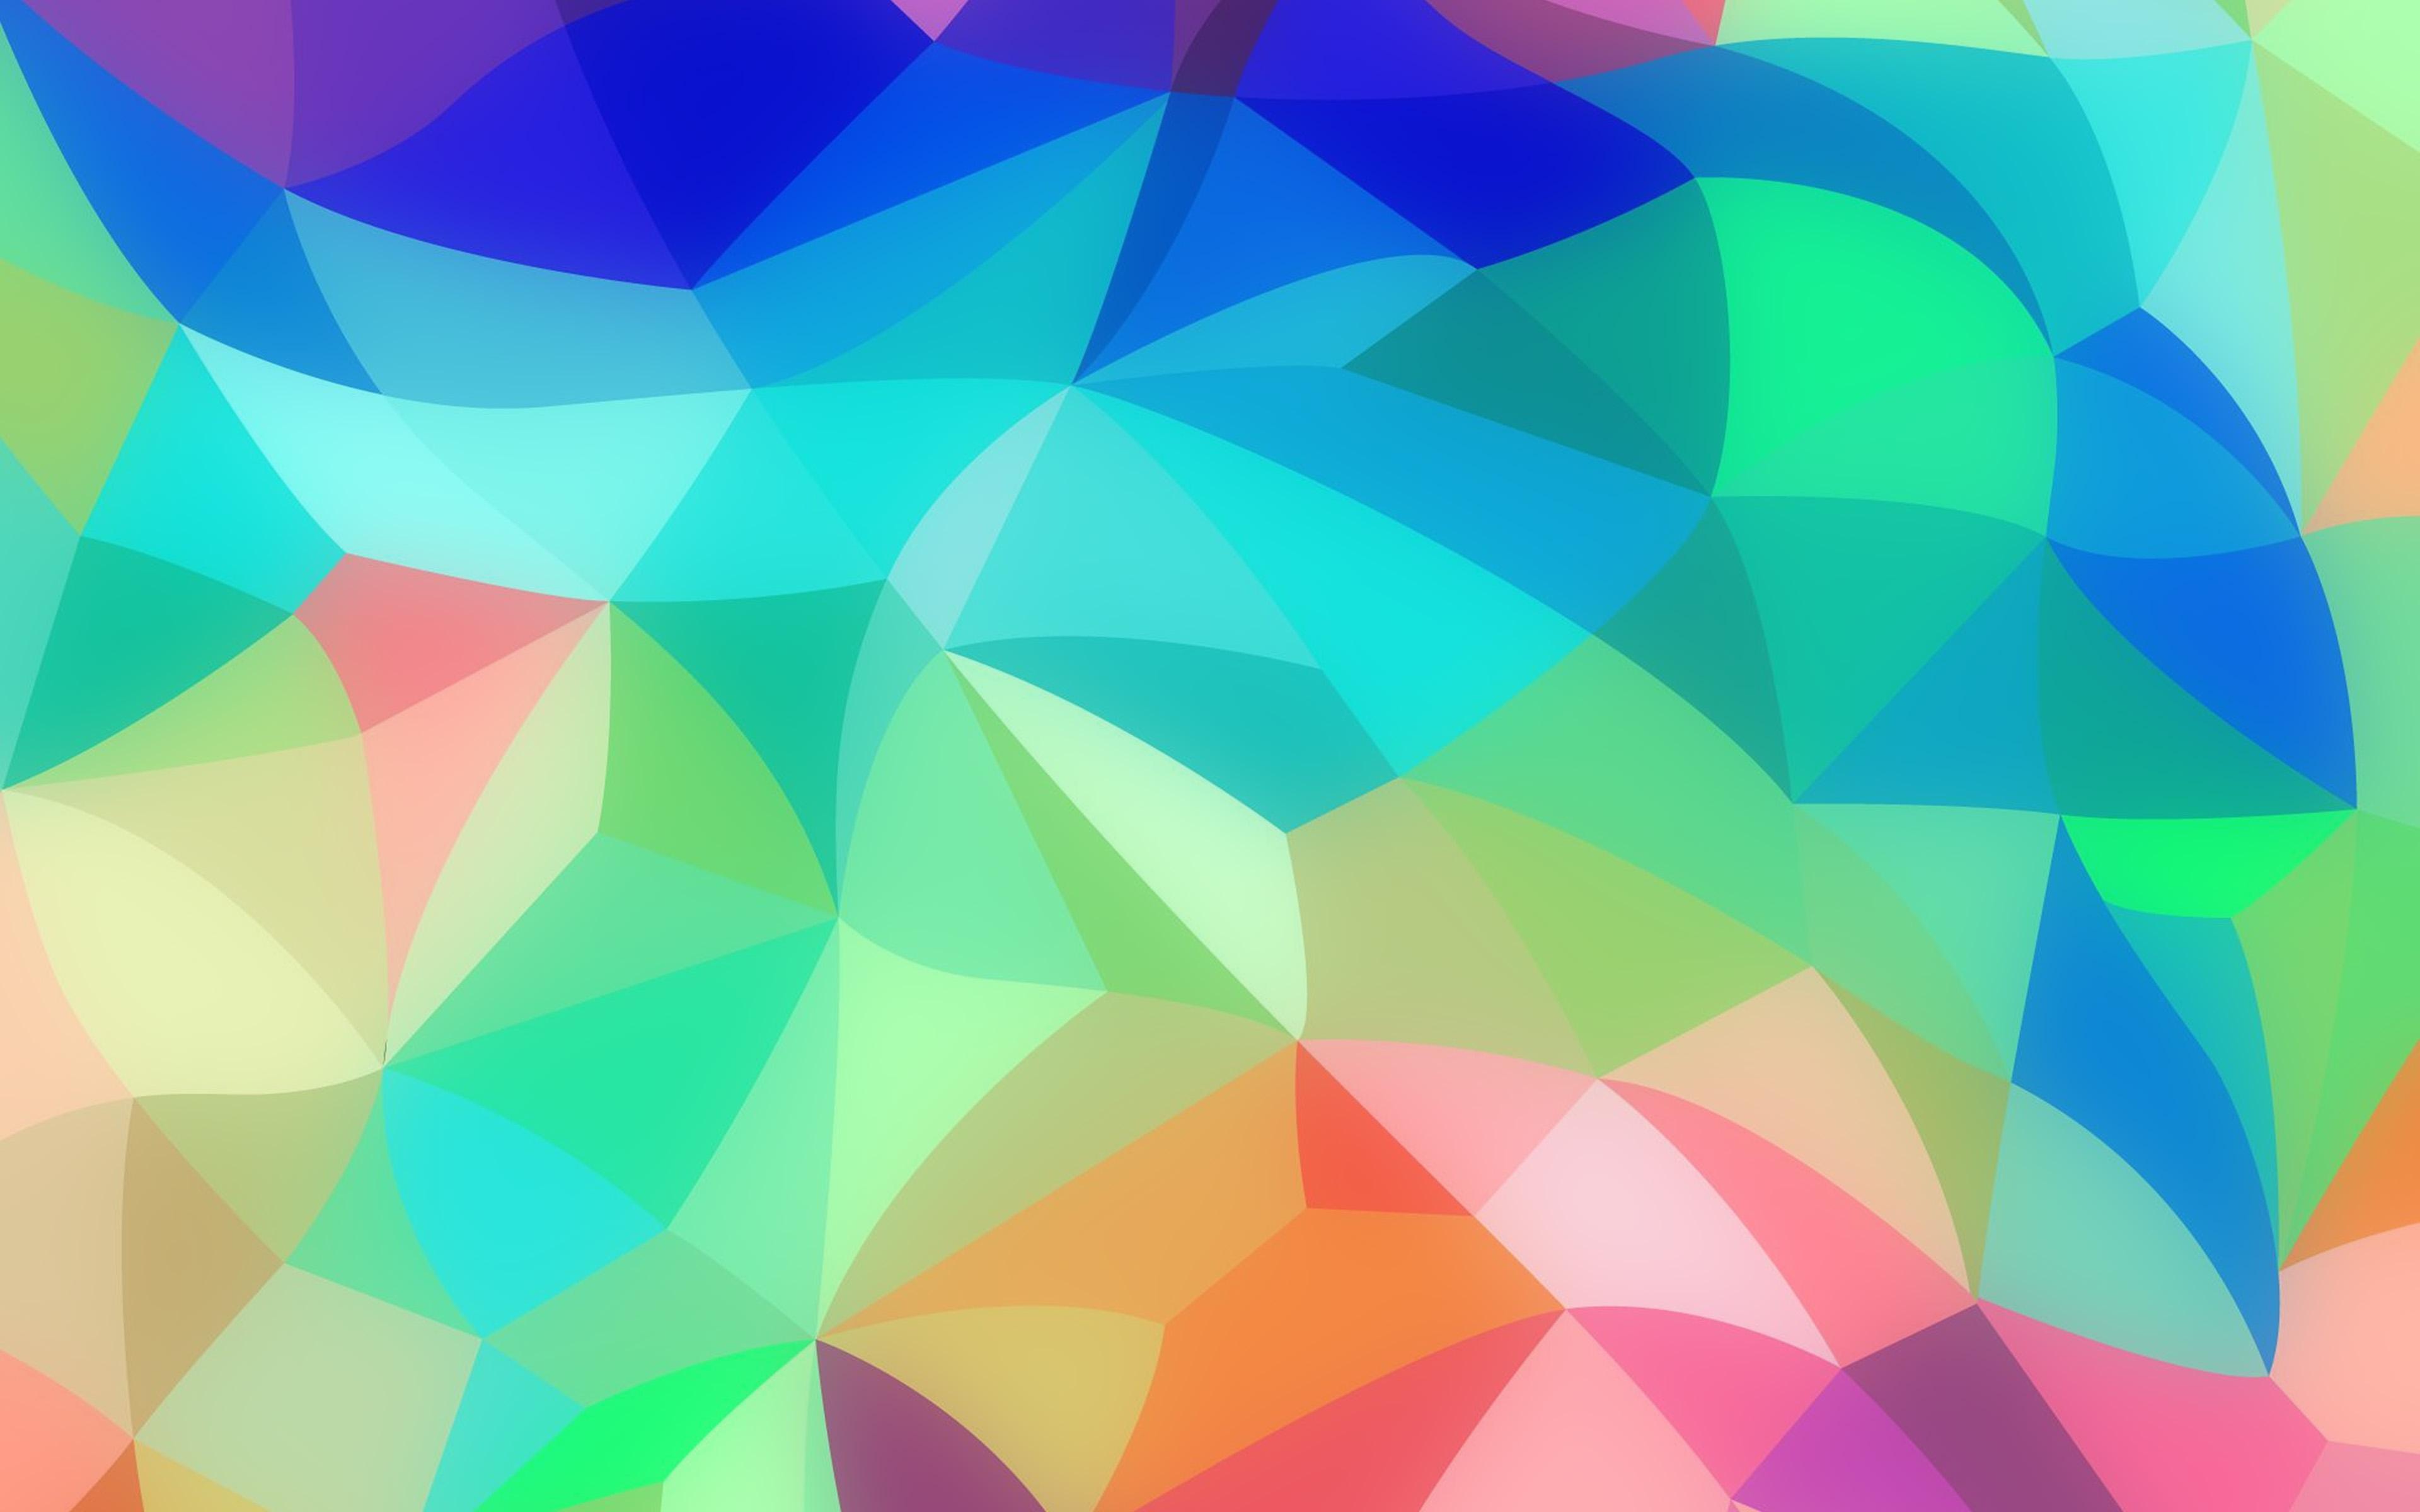 Car Logo Wallpaper Iphone 5 Vk40 Rainbow Abstract Colors Pastel Pattern Wallpaper